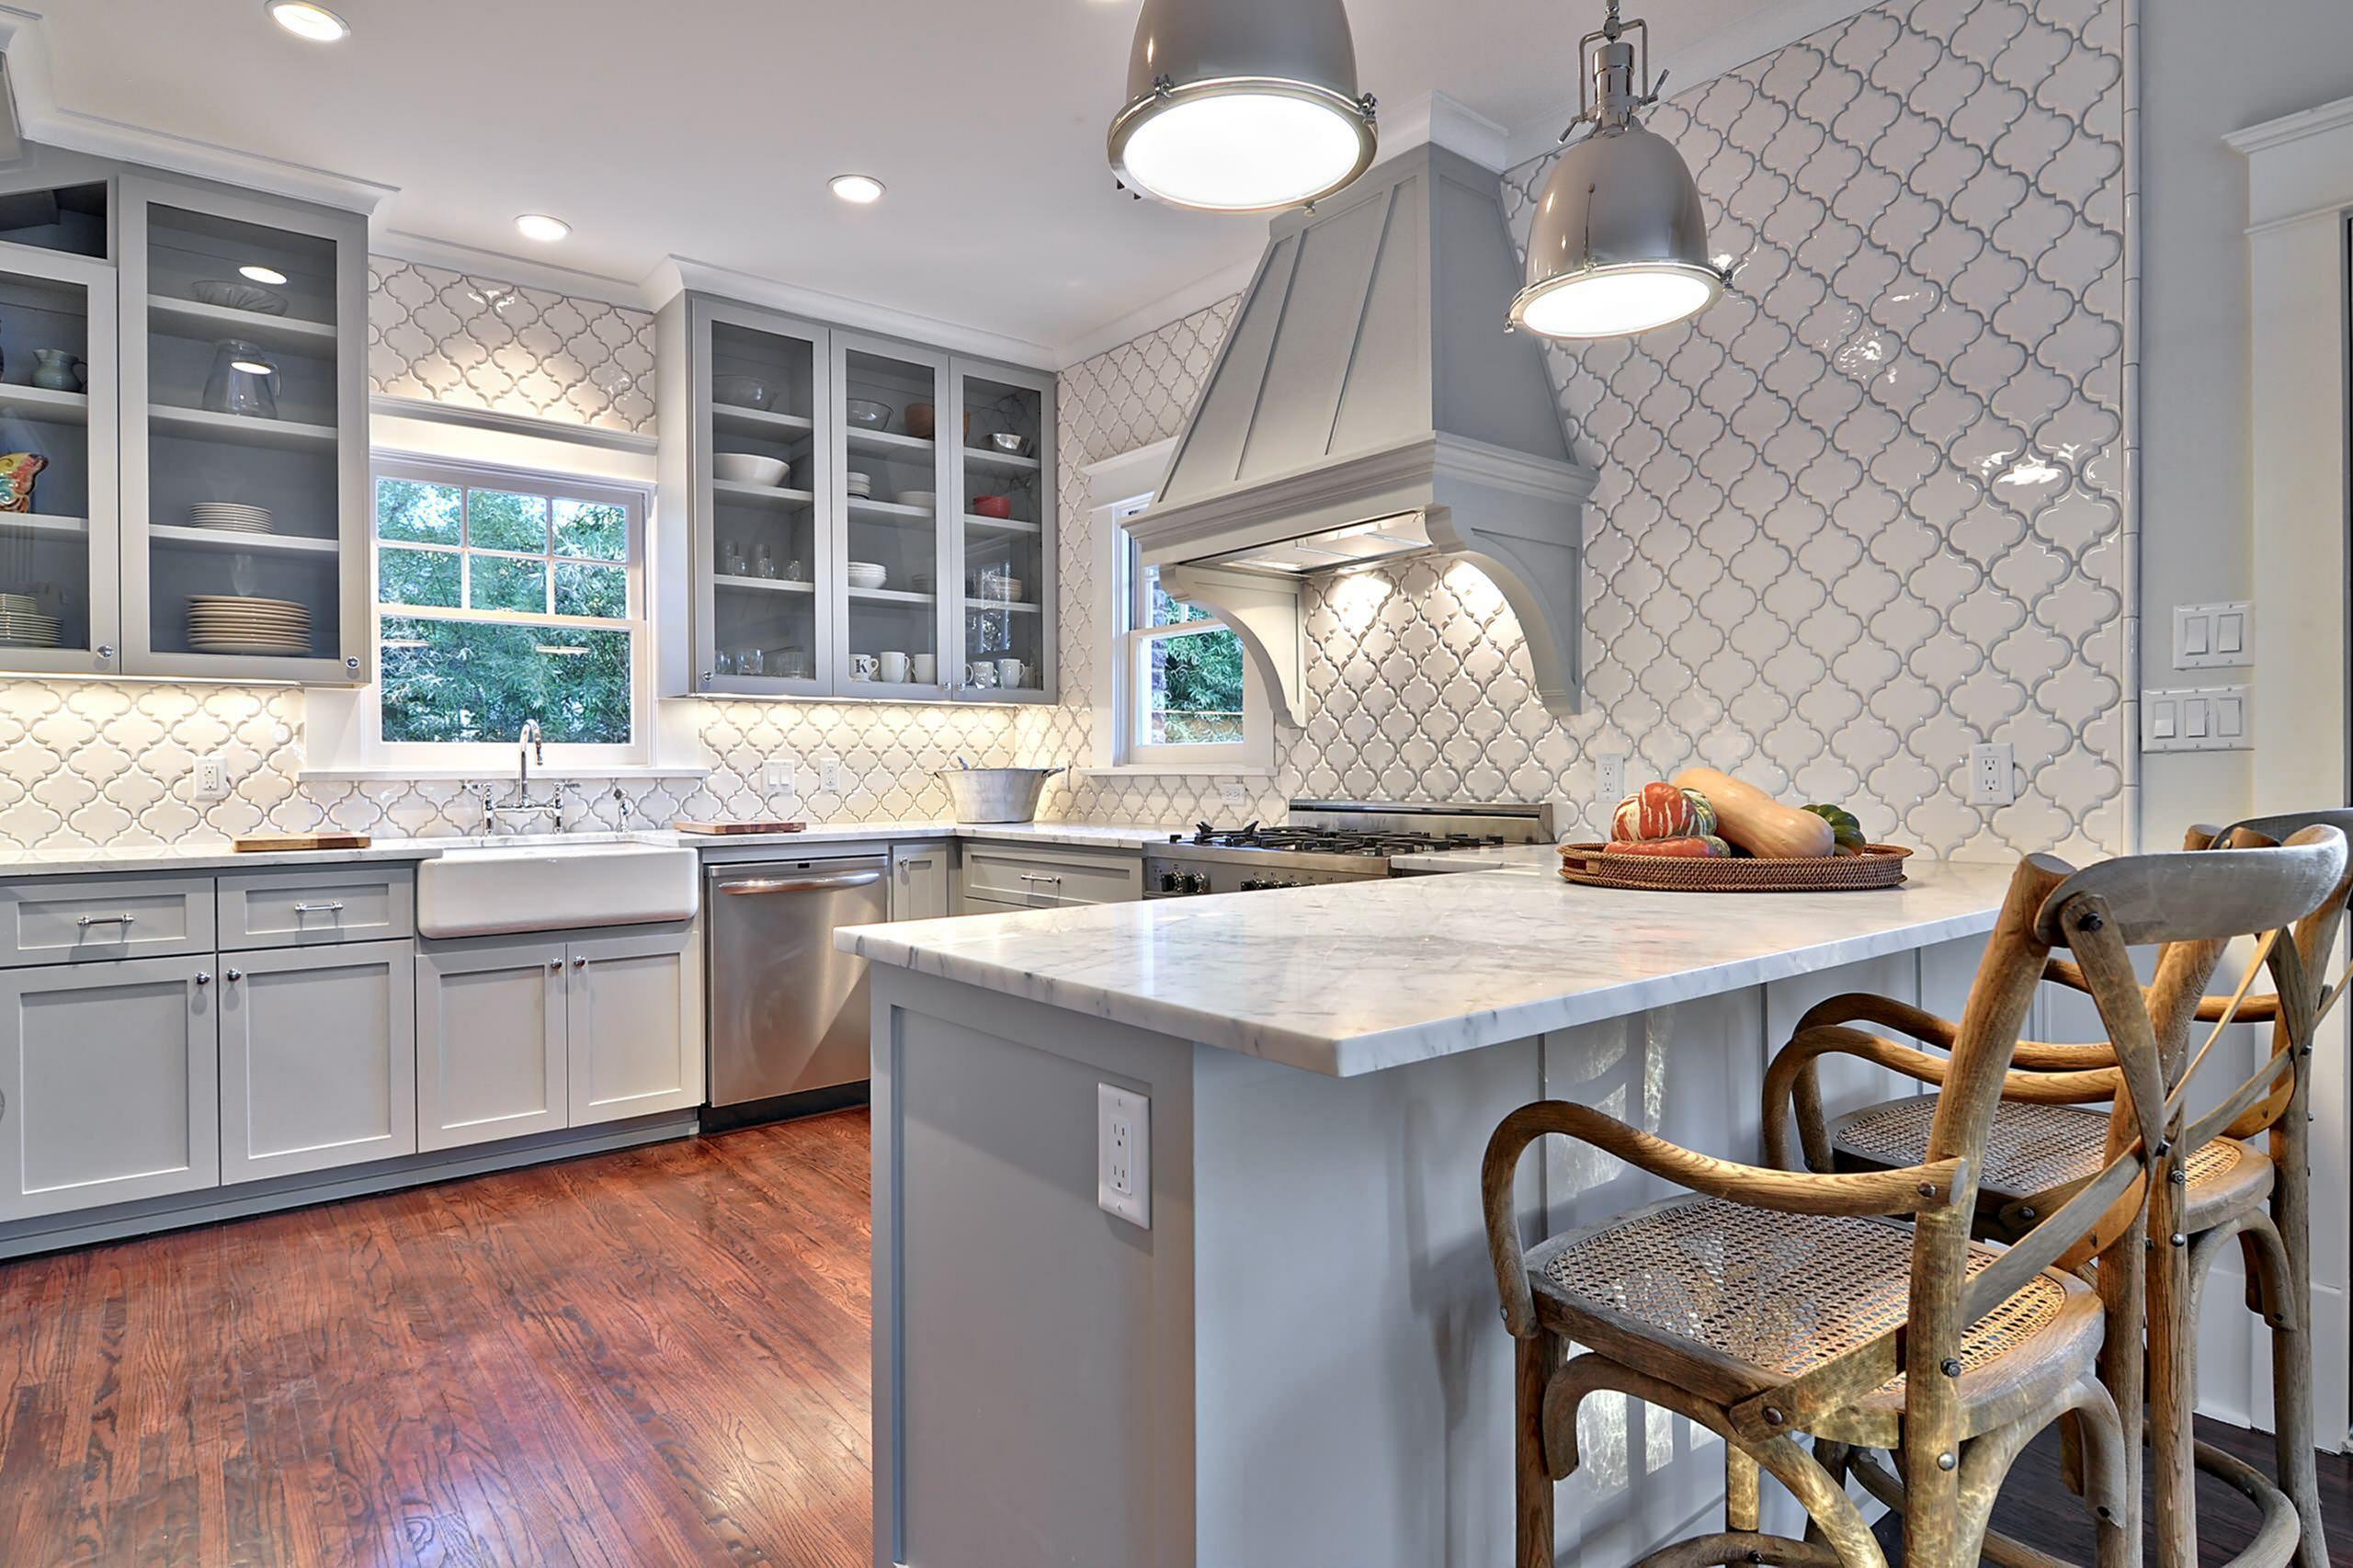 8 Fabulous Backsplash Design Ideas To Beautify Your Kitchen Grey Kitchen Cabinets Light Grey Kitchens Grey Kitchen